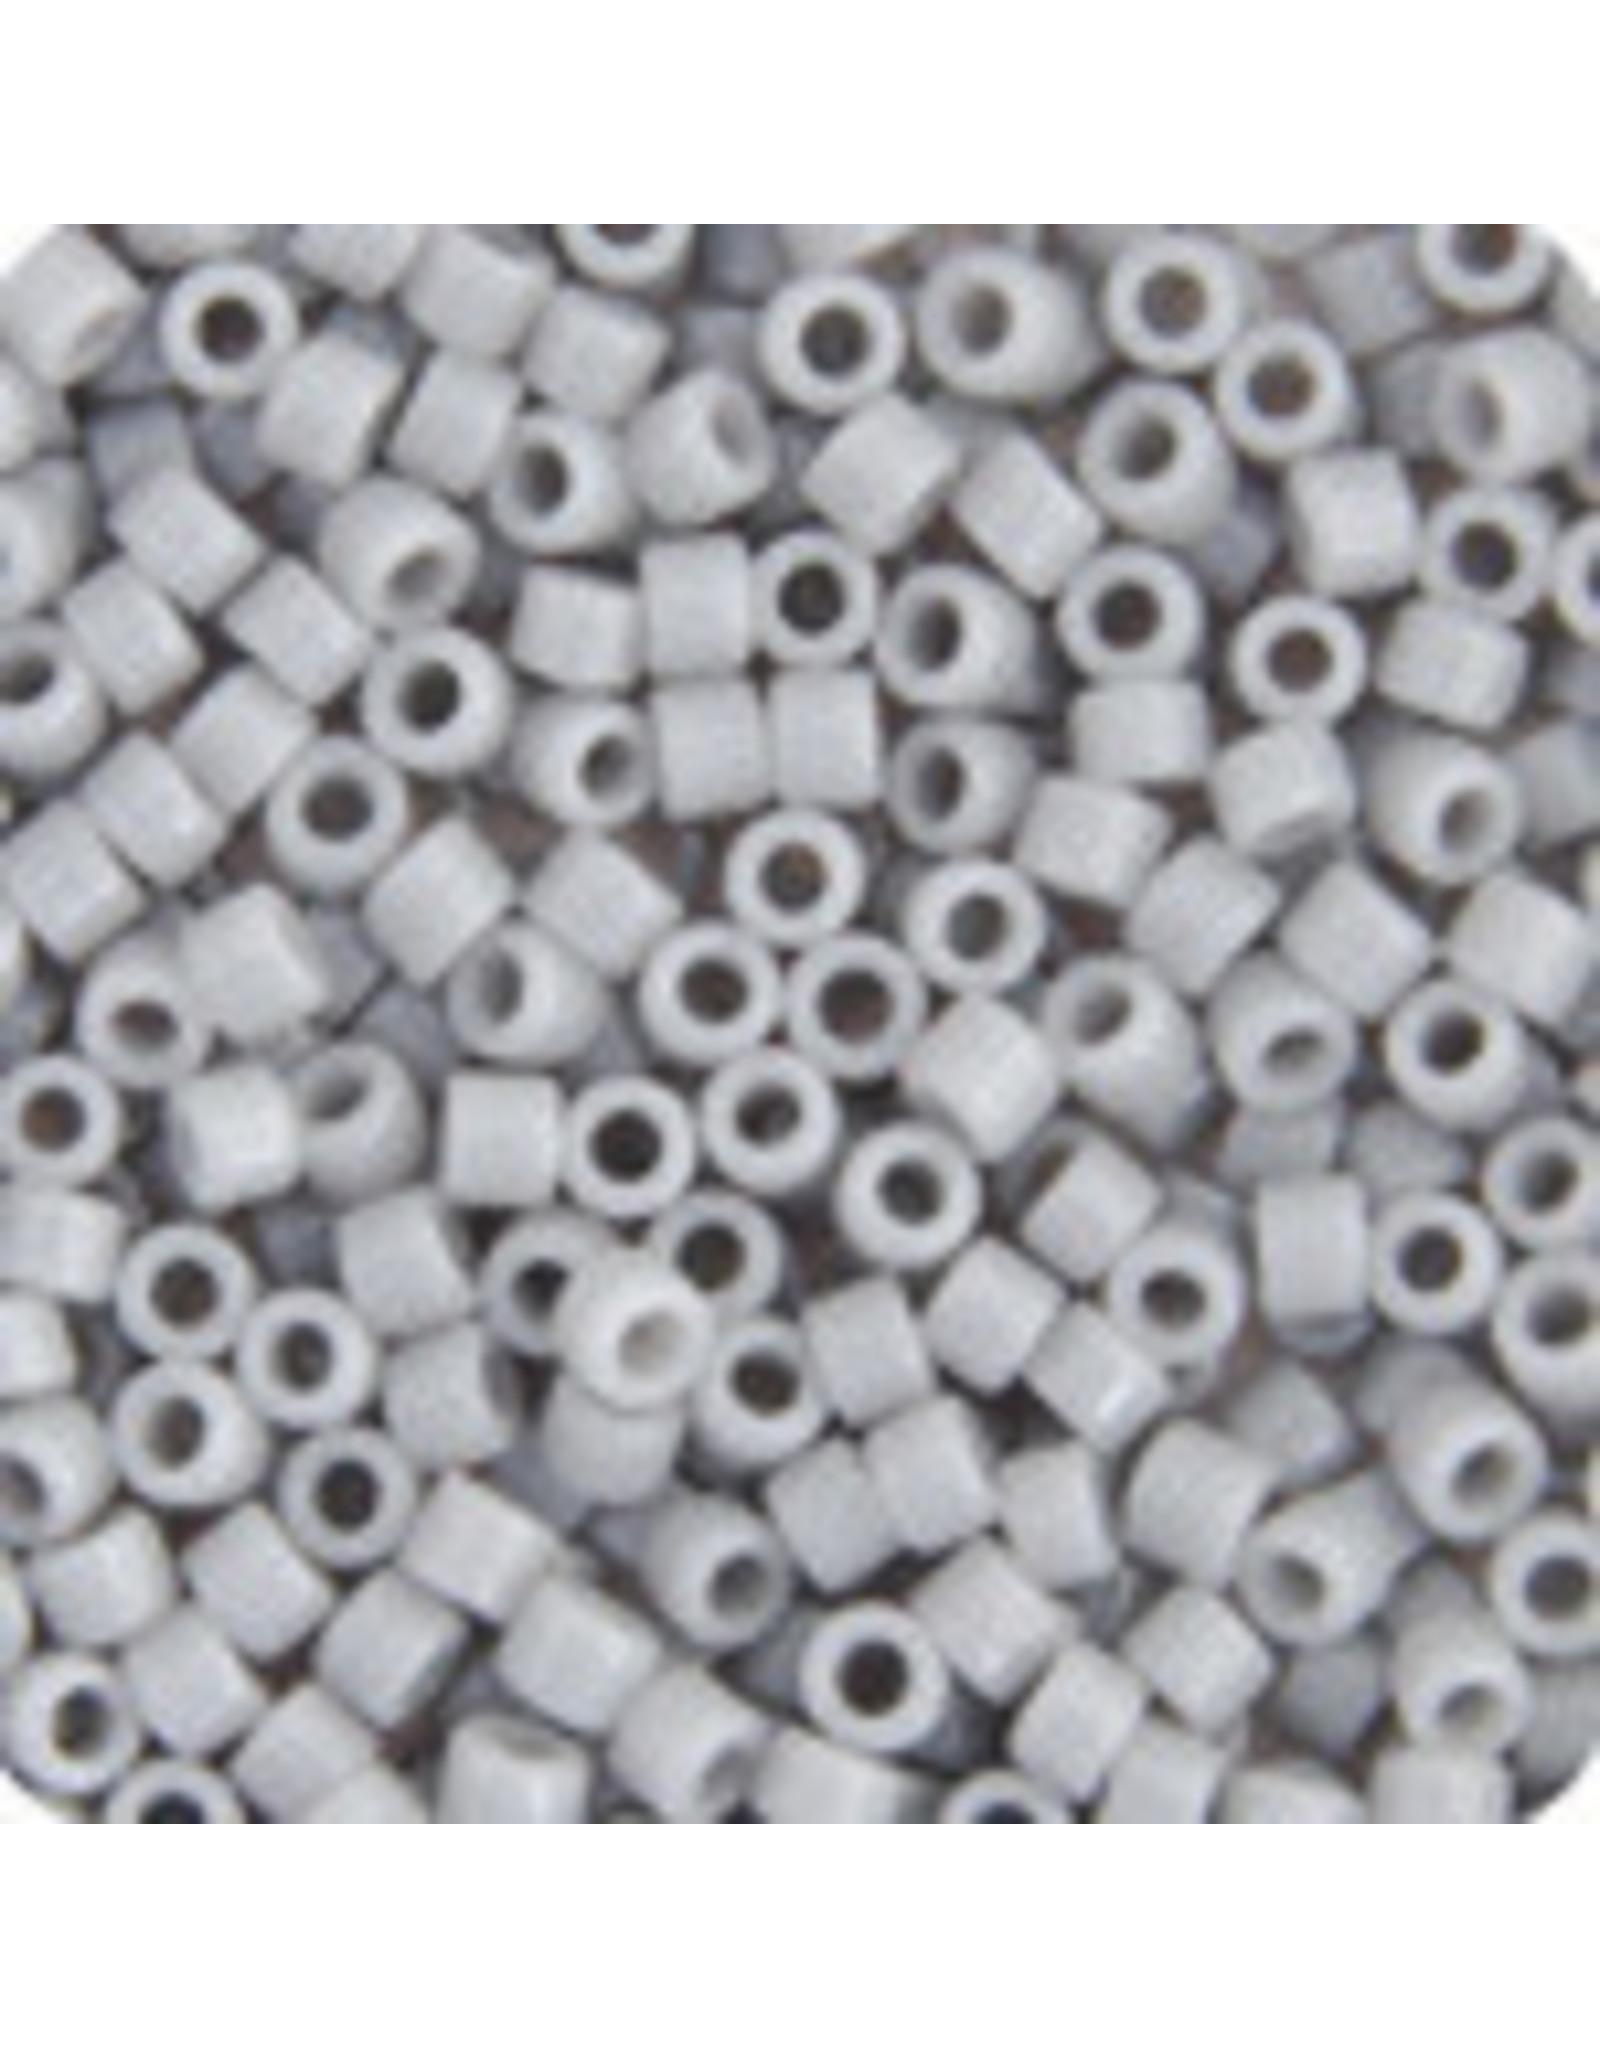 Miyuki db1139 11 Delica 3.5g Opaque Grey